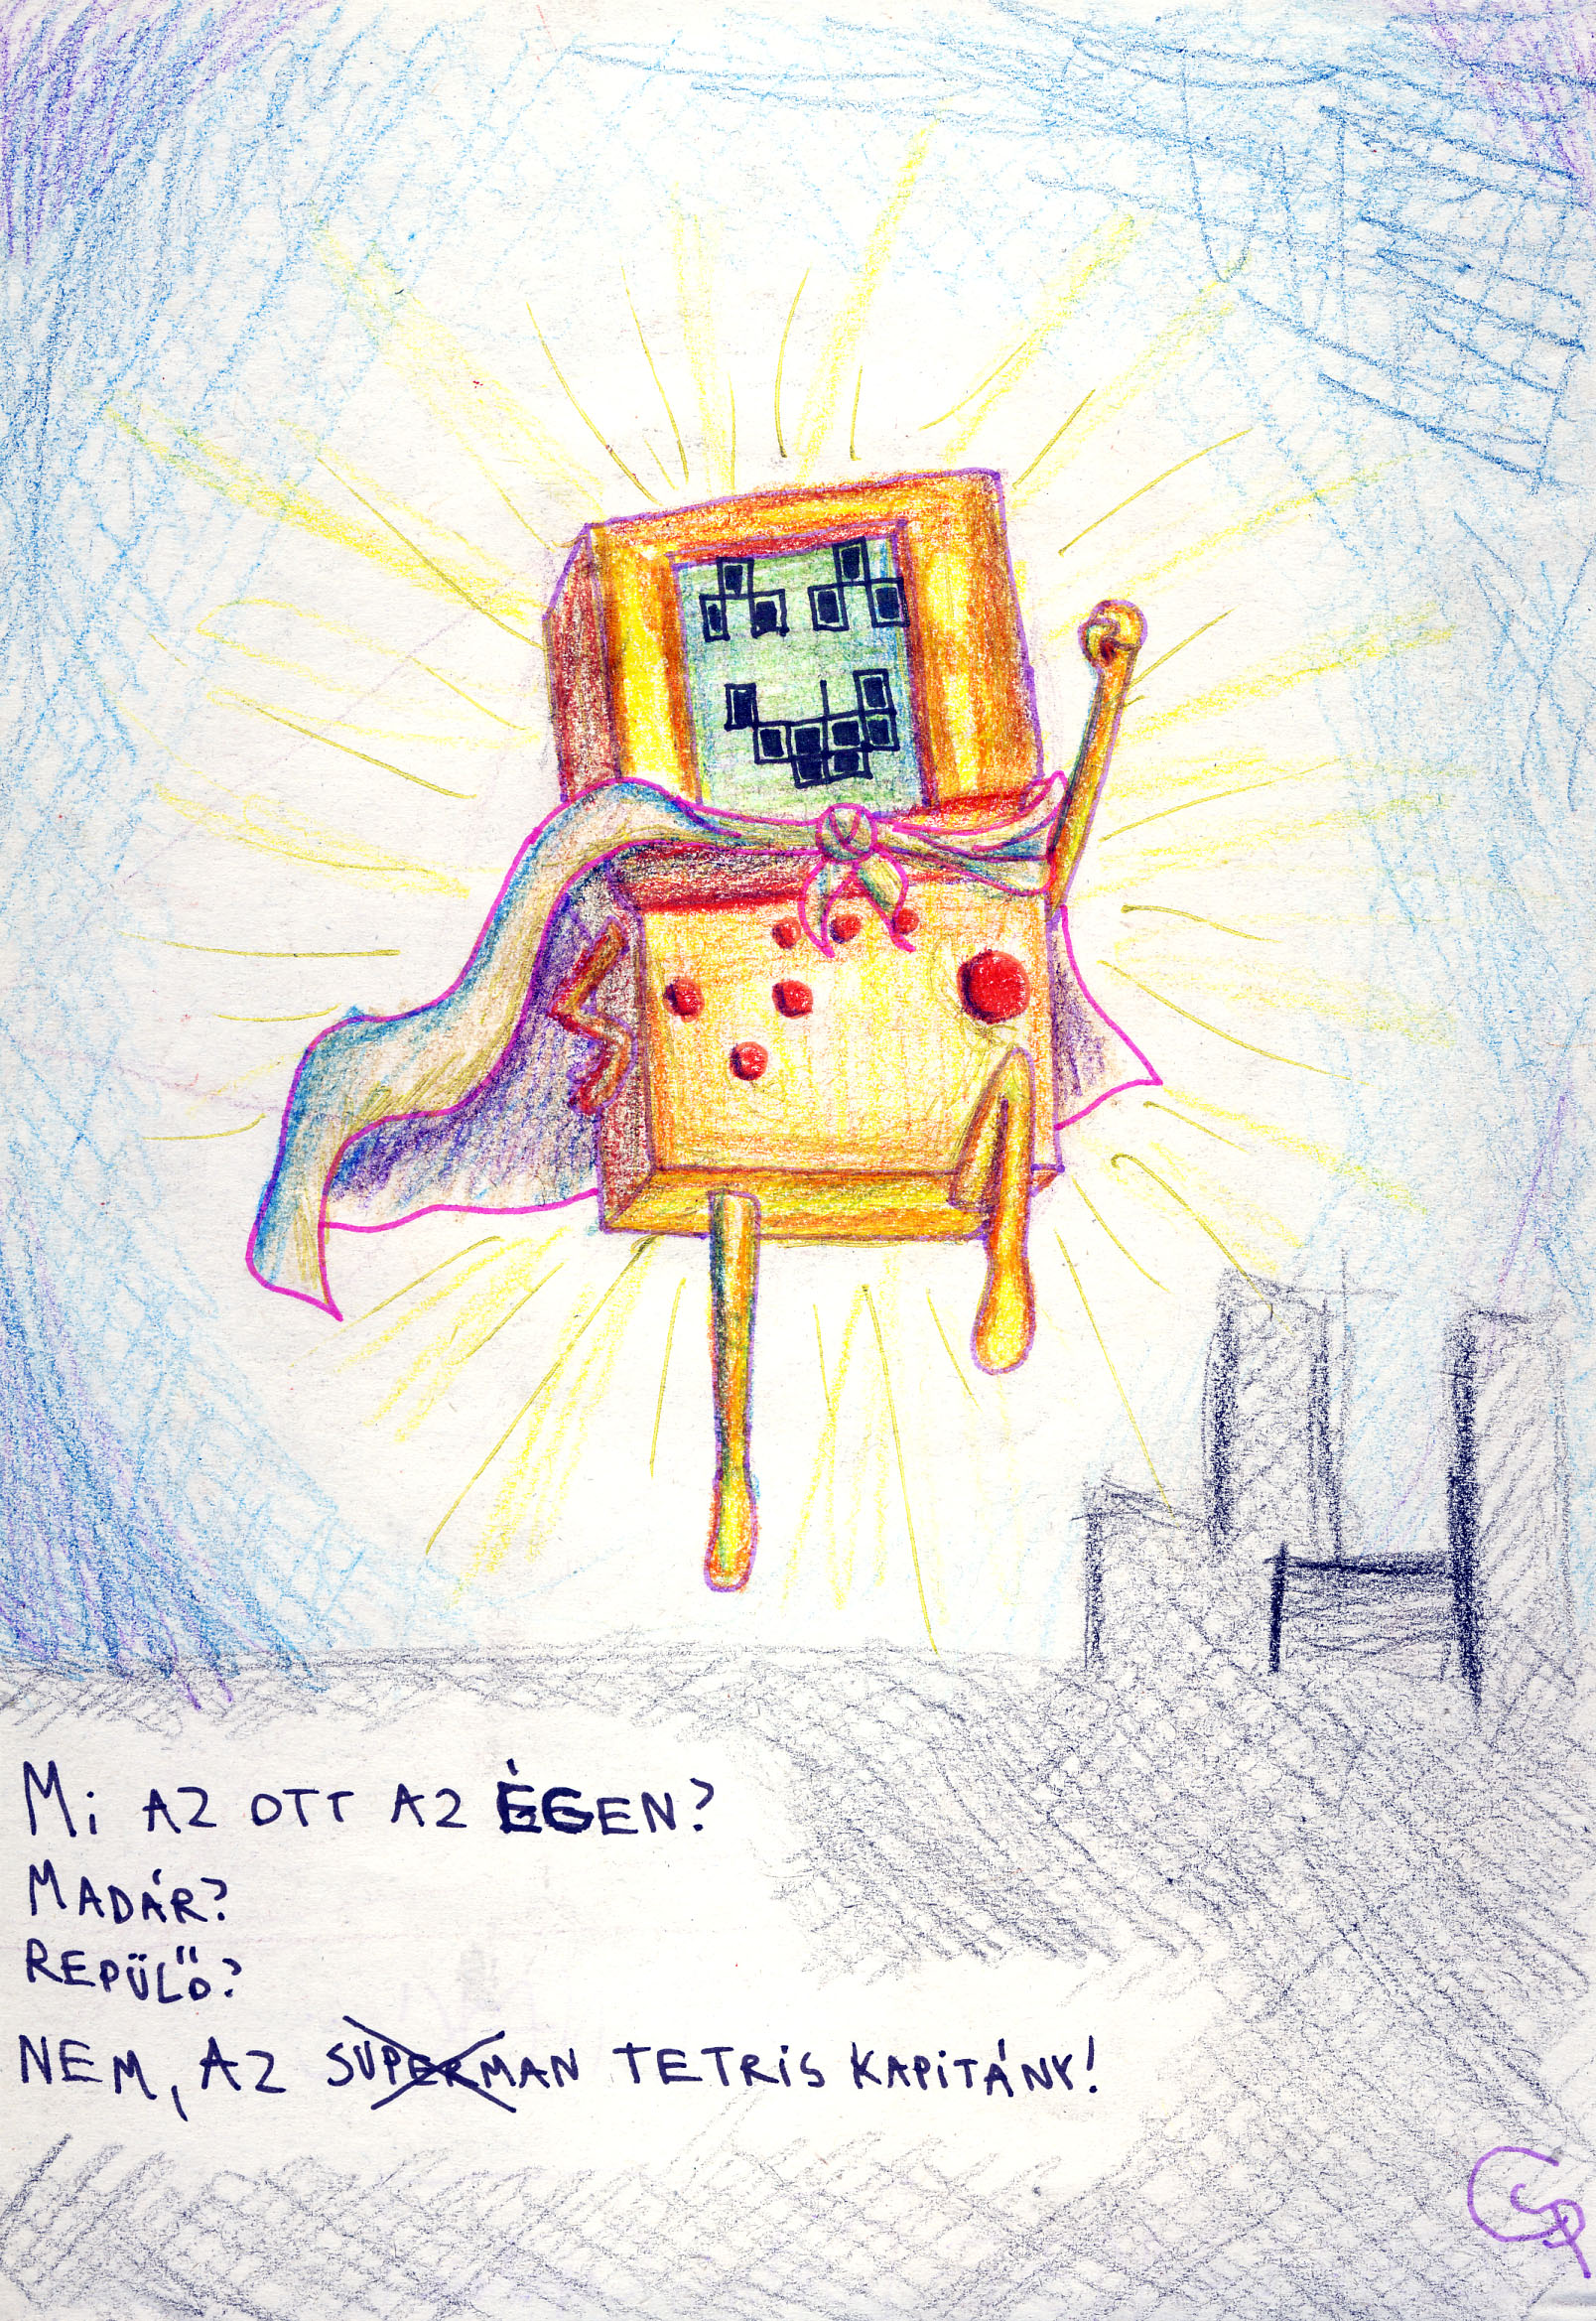 Capitain Tetris